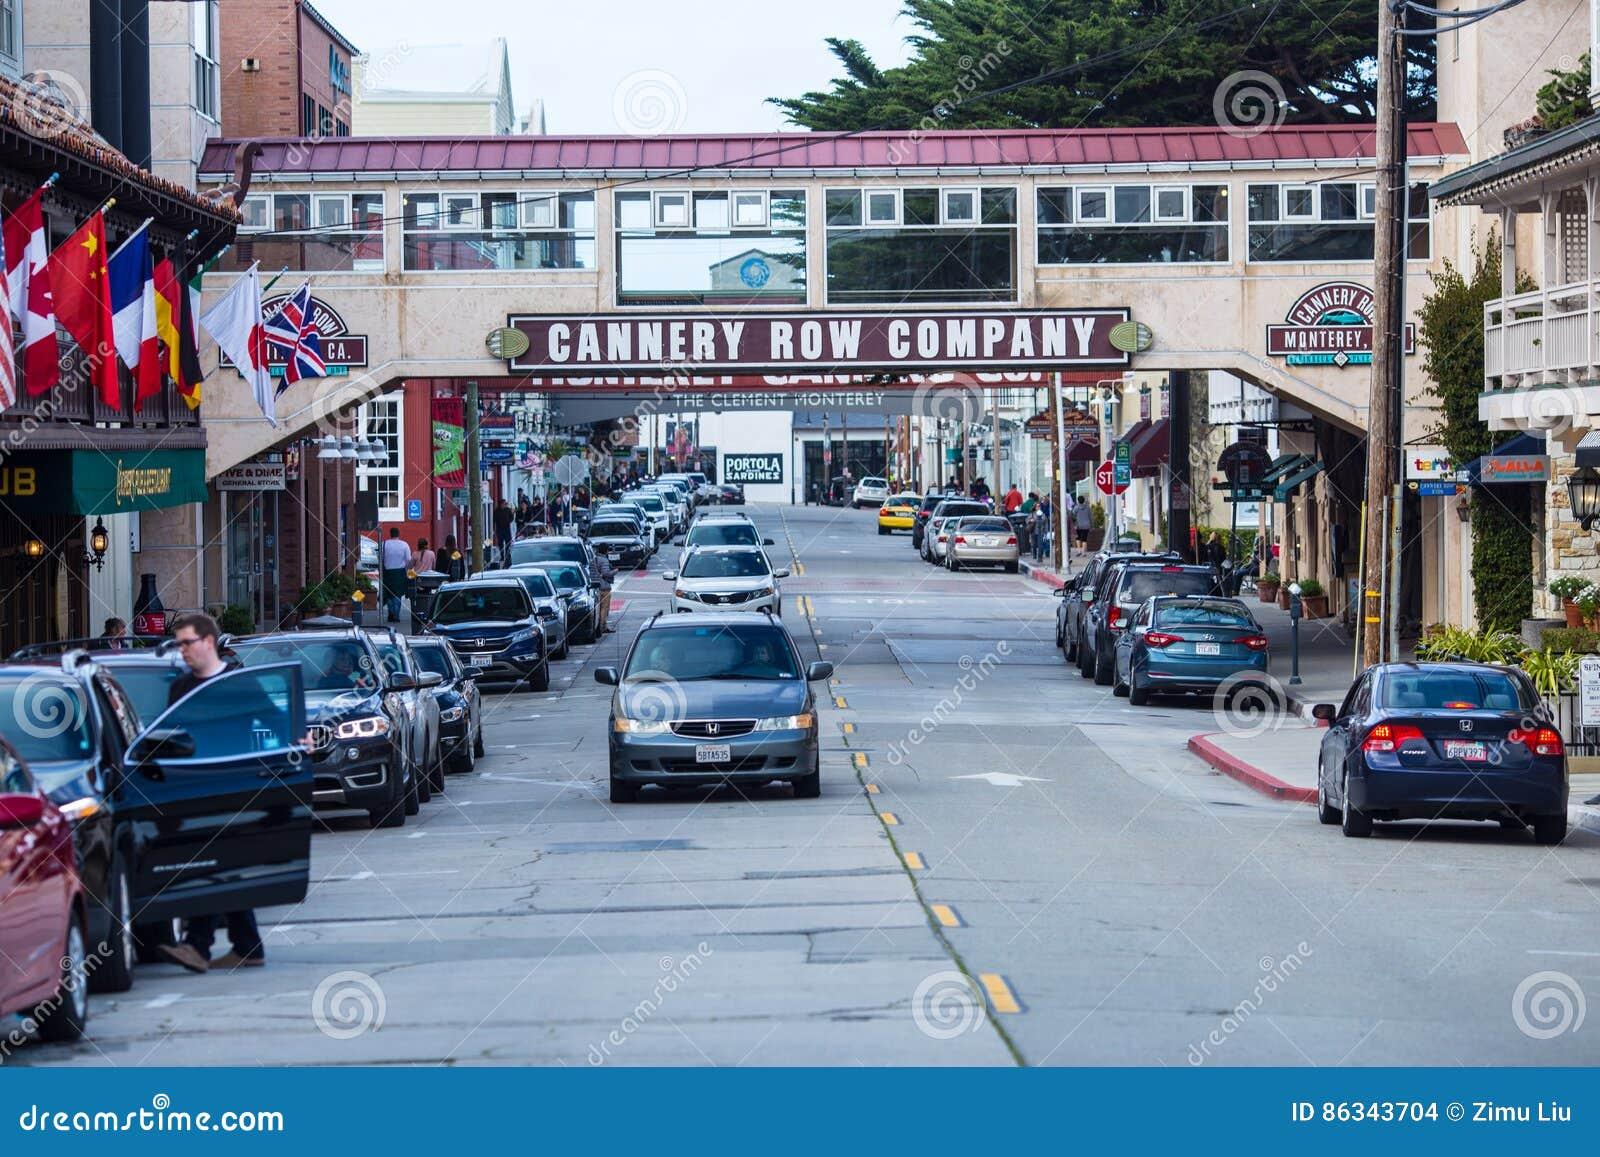 Rangée de Canery, Monterey